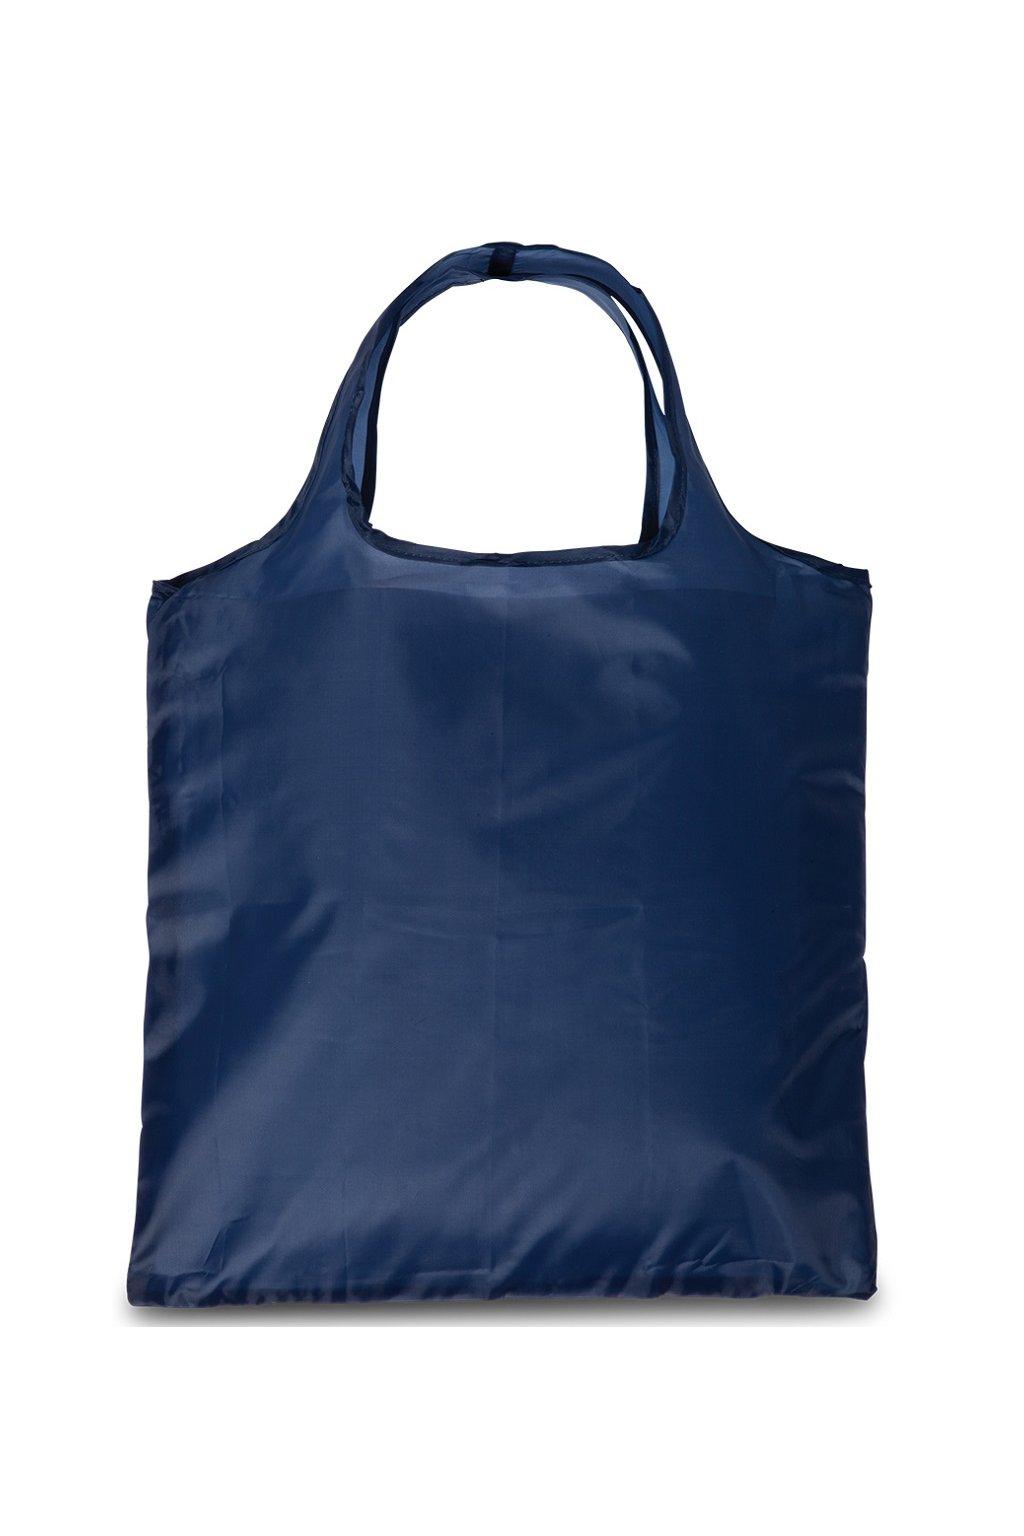 kufrland fabrizio shoppingbag 80978 9900 (2)